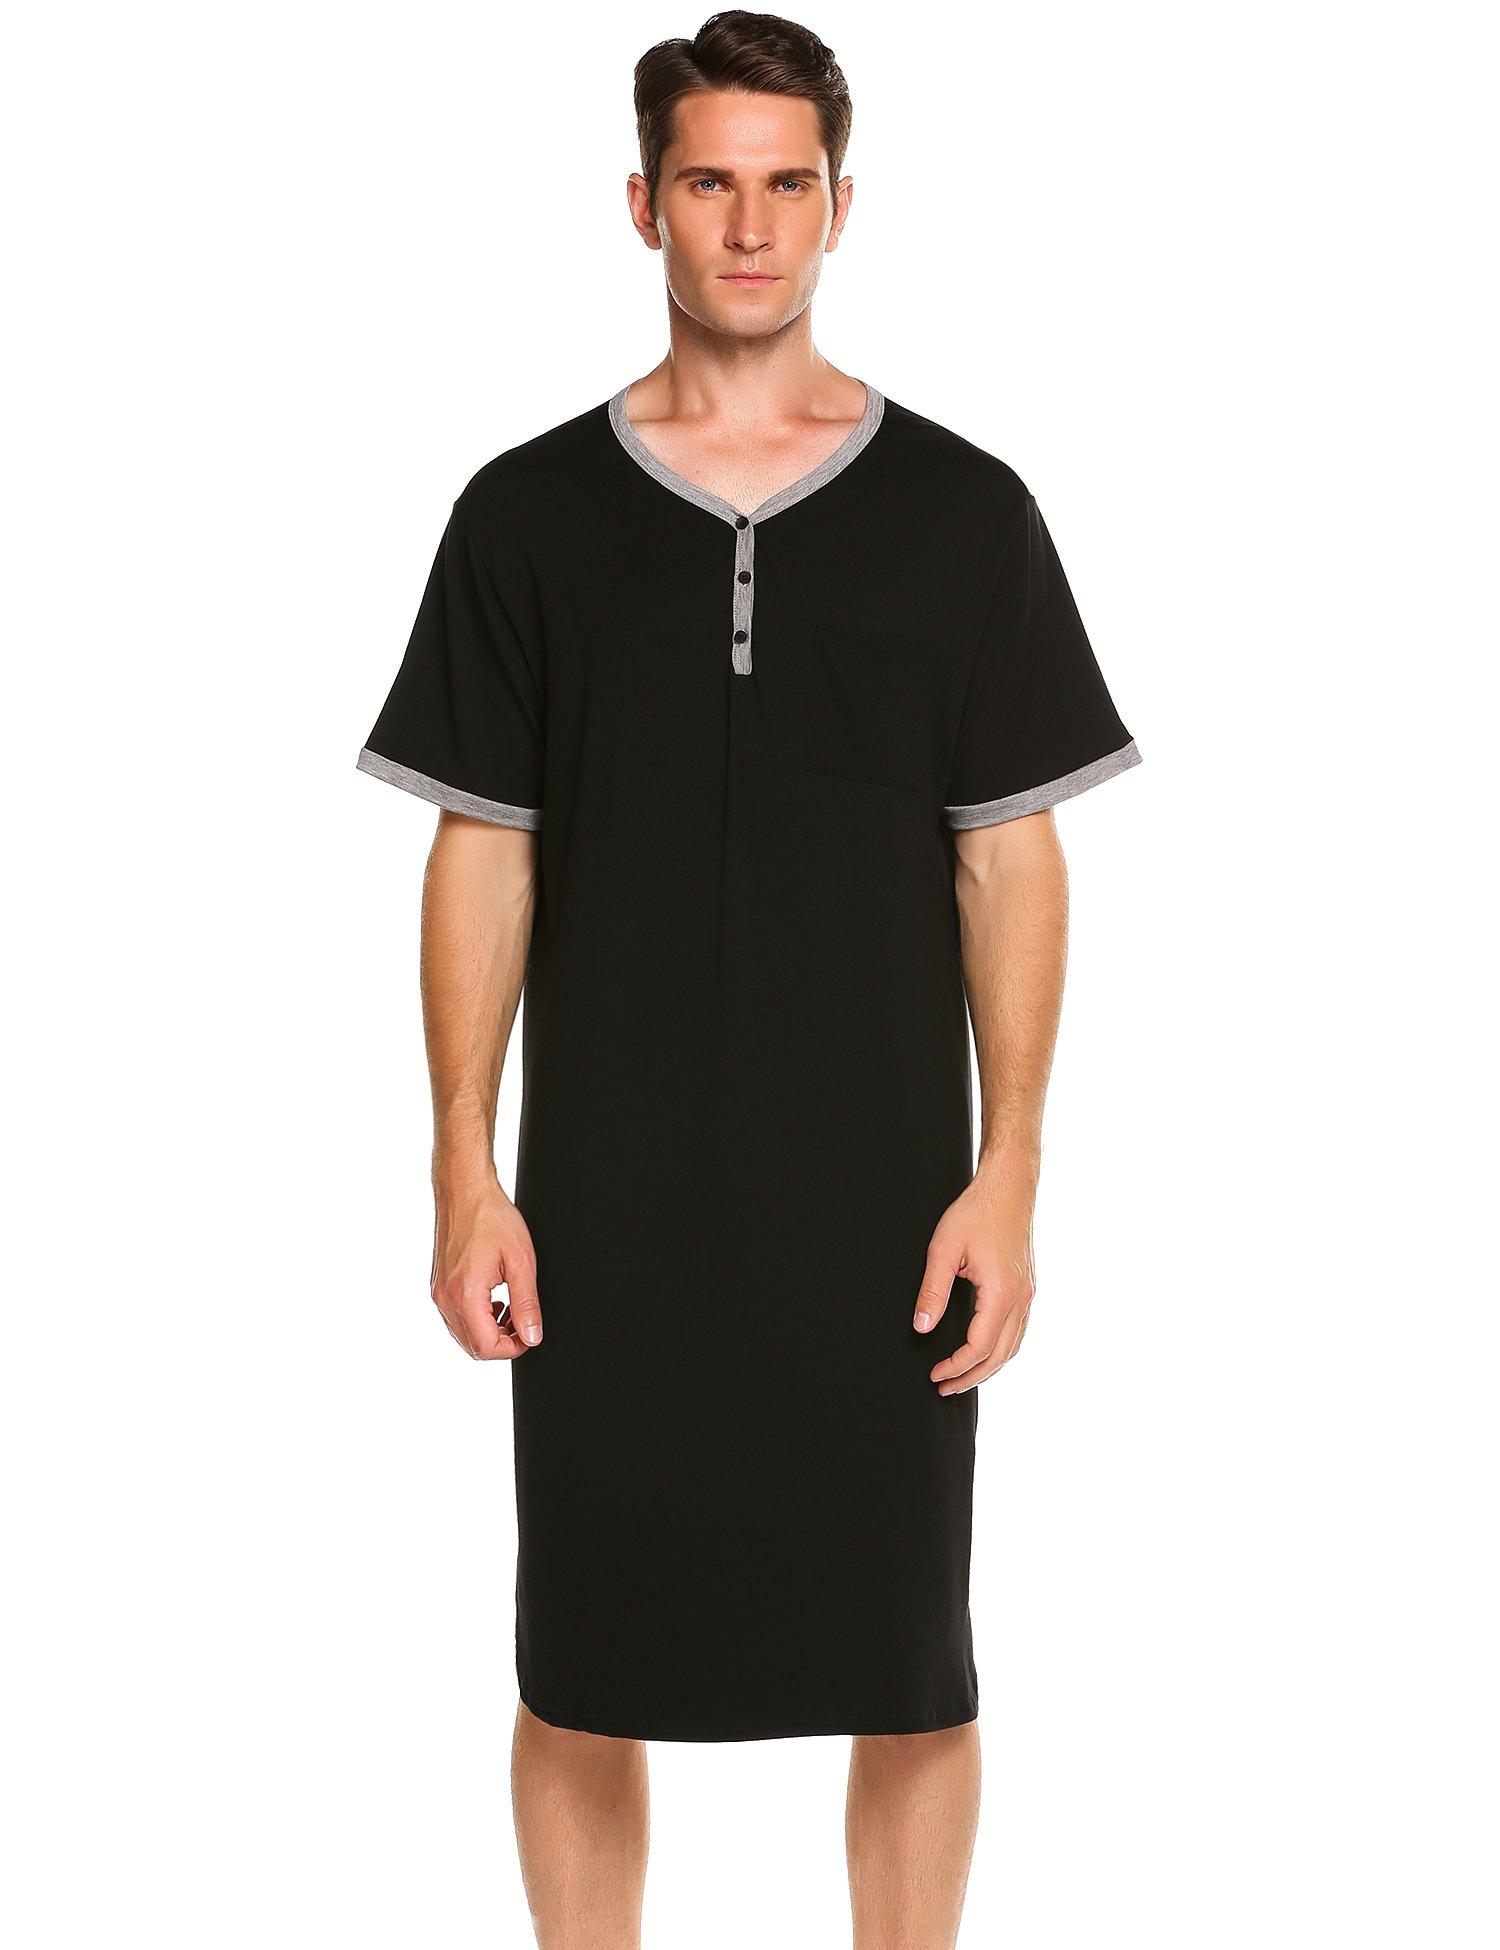 Ekouaer Men's Sleepwear Cotton Sleepwear Soft Nightshirt,A-black,X-Large